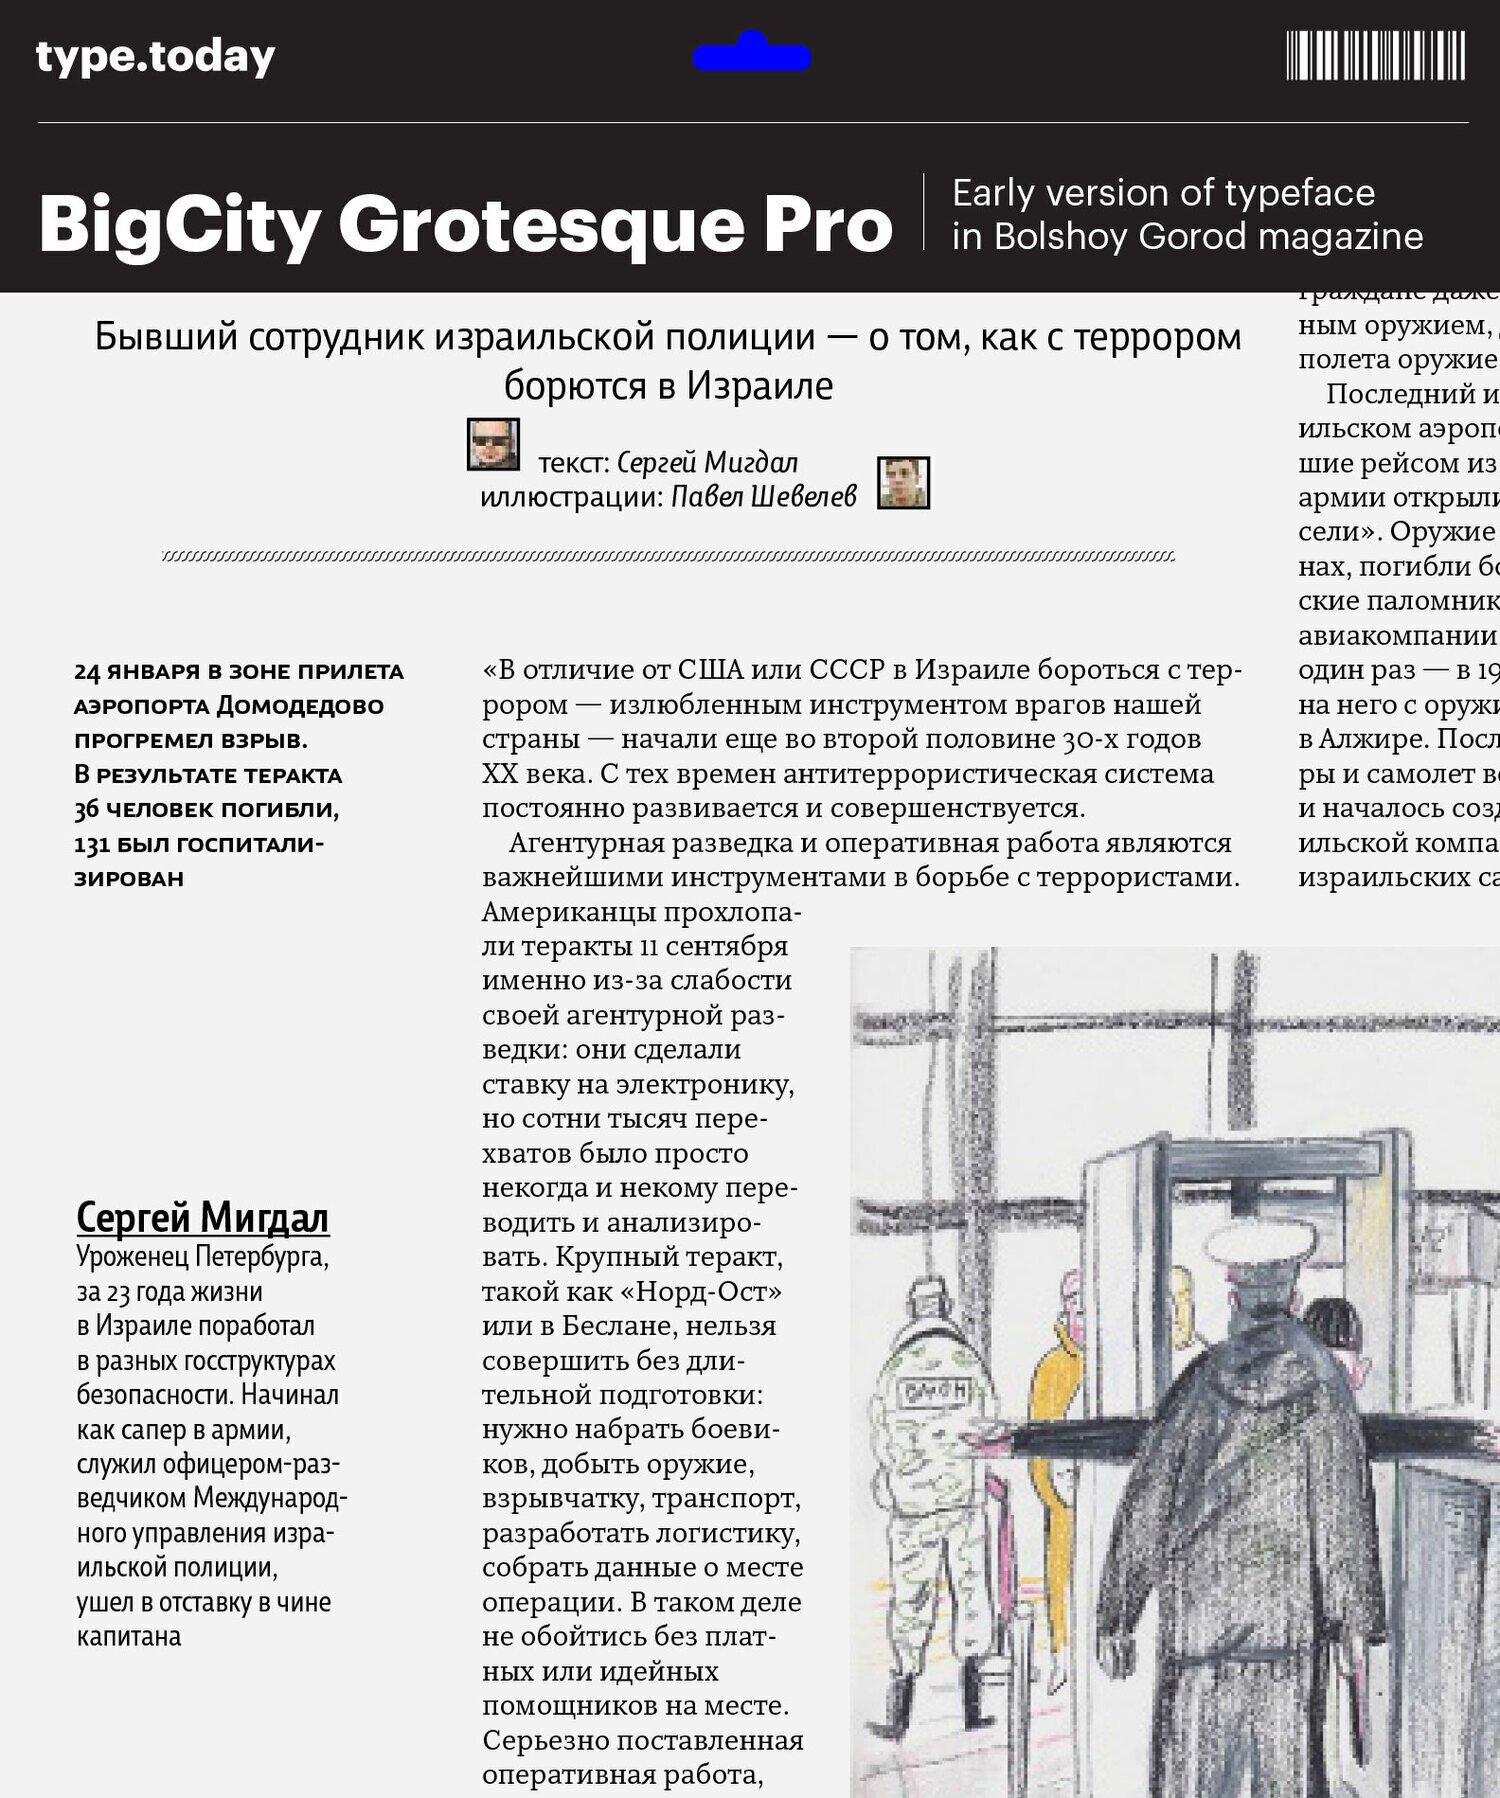 TT_BigCity_BG_2